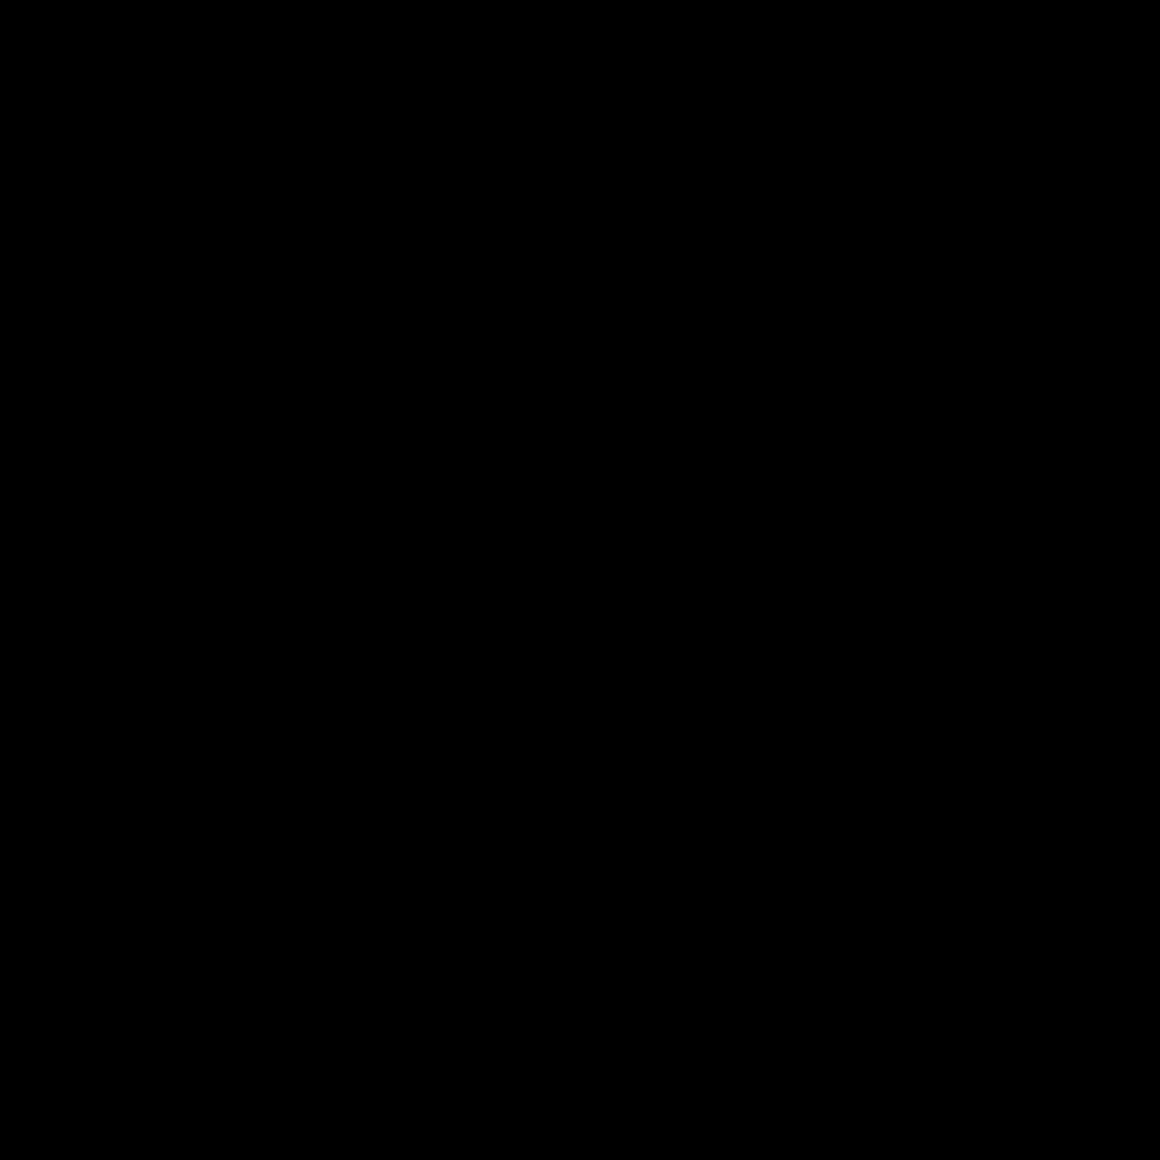 Power Lines Icon